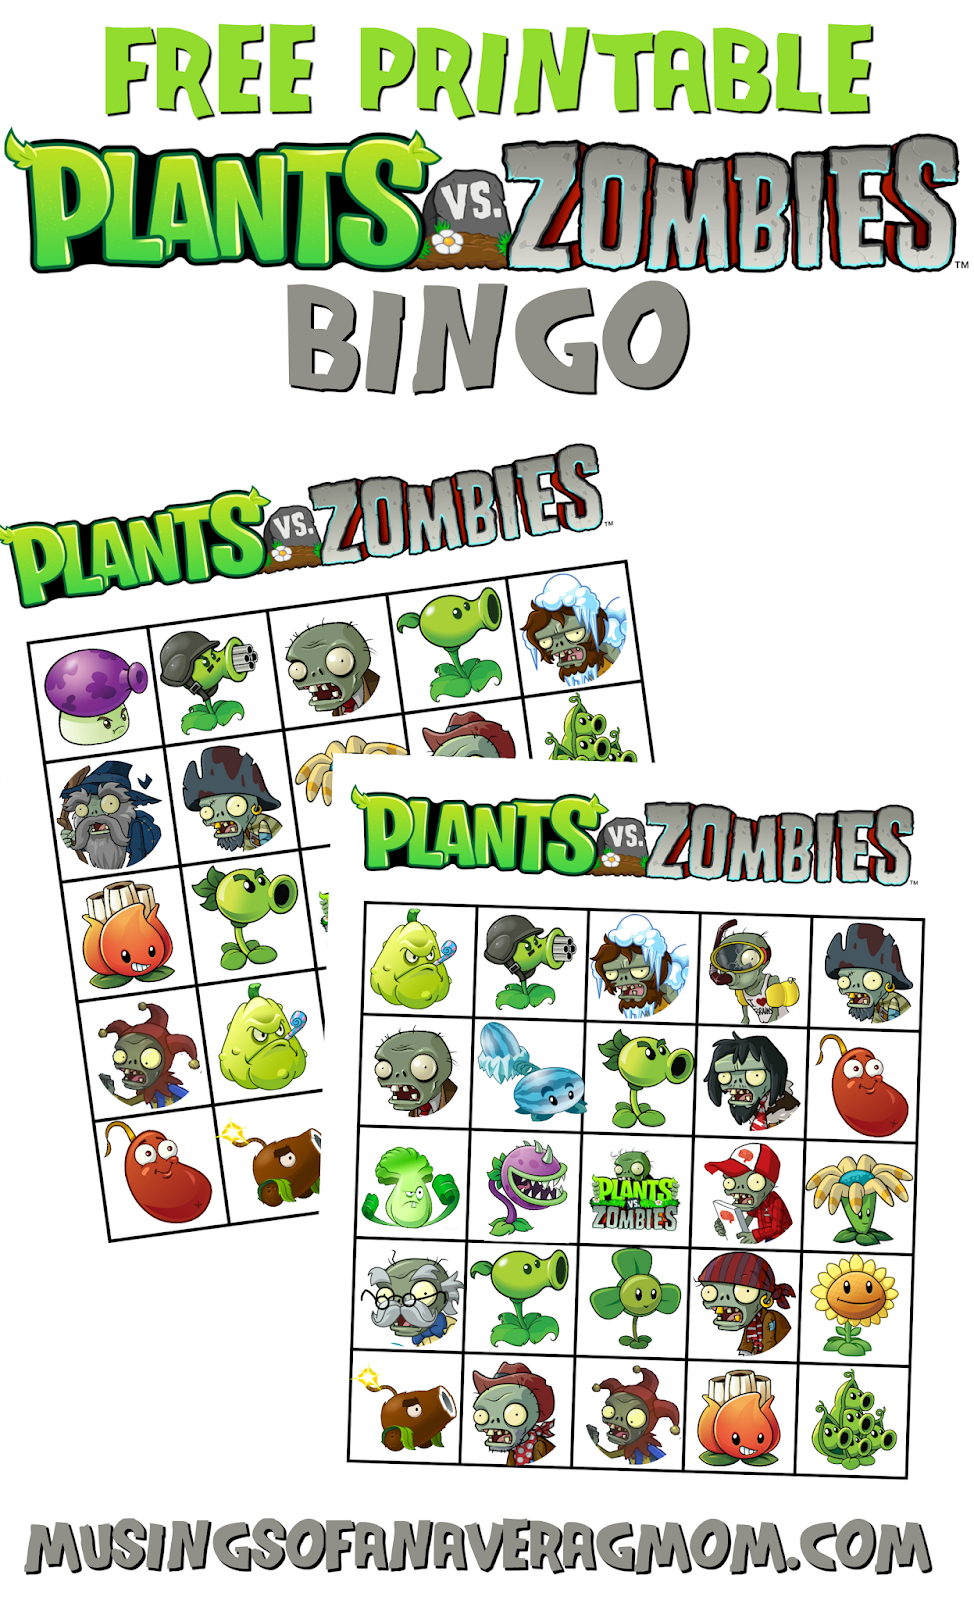 Musings Of An Average Mom: Plants Vs. Zombies Bingo - Plants Vs Zombies Free Printable Invitations